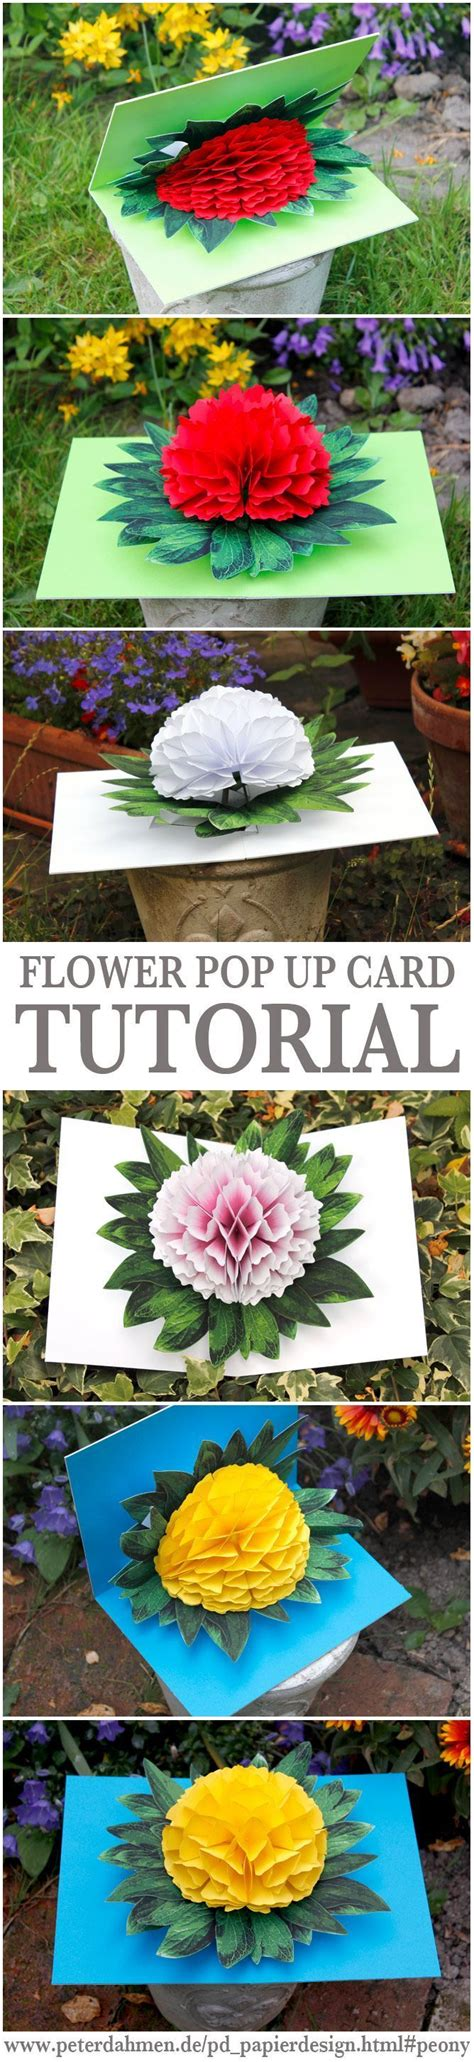 flower pop up card templates dahmen 10 creative diy s day gift ideas card tutorials